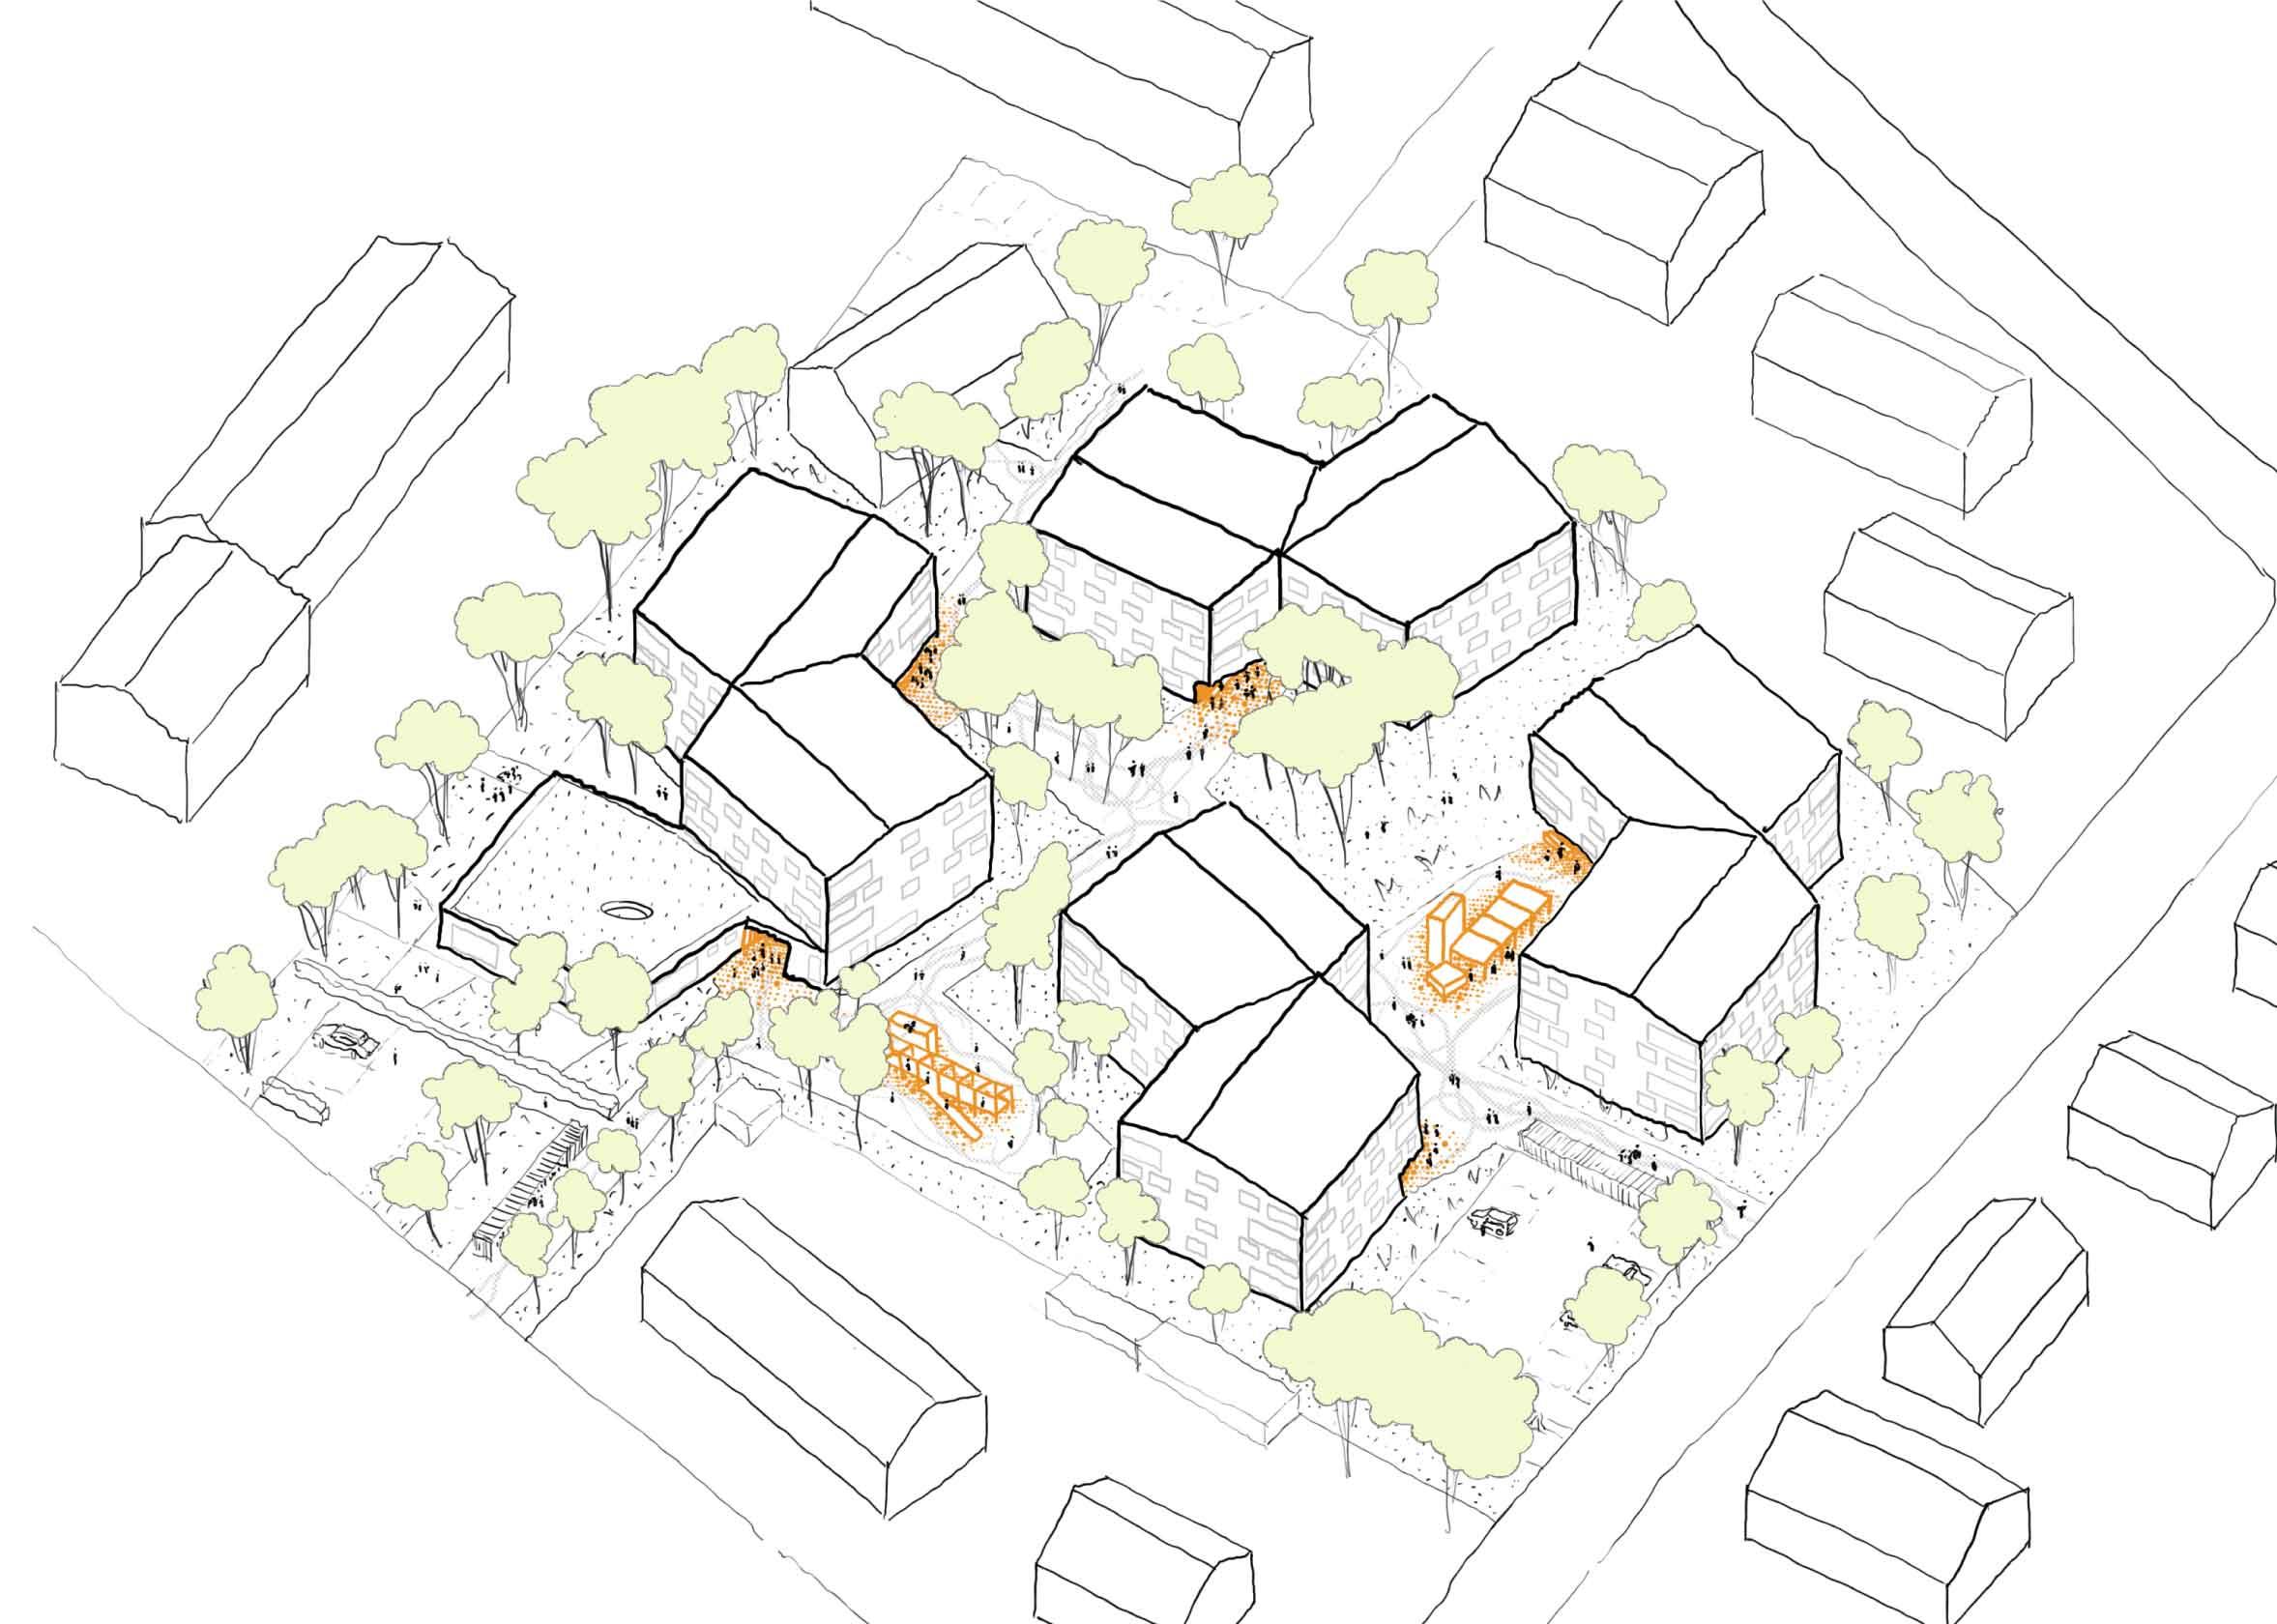 STUDIOKUBIK-architektur-architecture-berlin-wohnanlage-karl-wagner-straße-bad-aibling-skizze